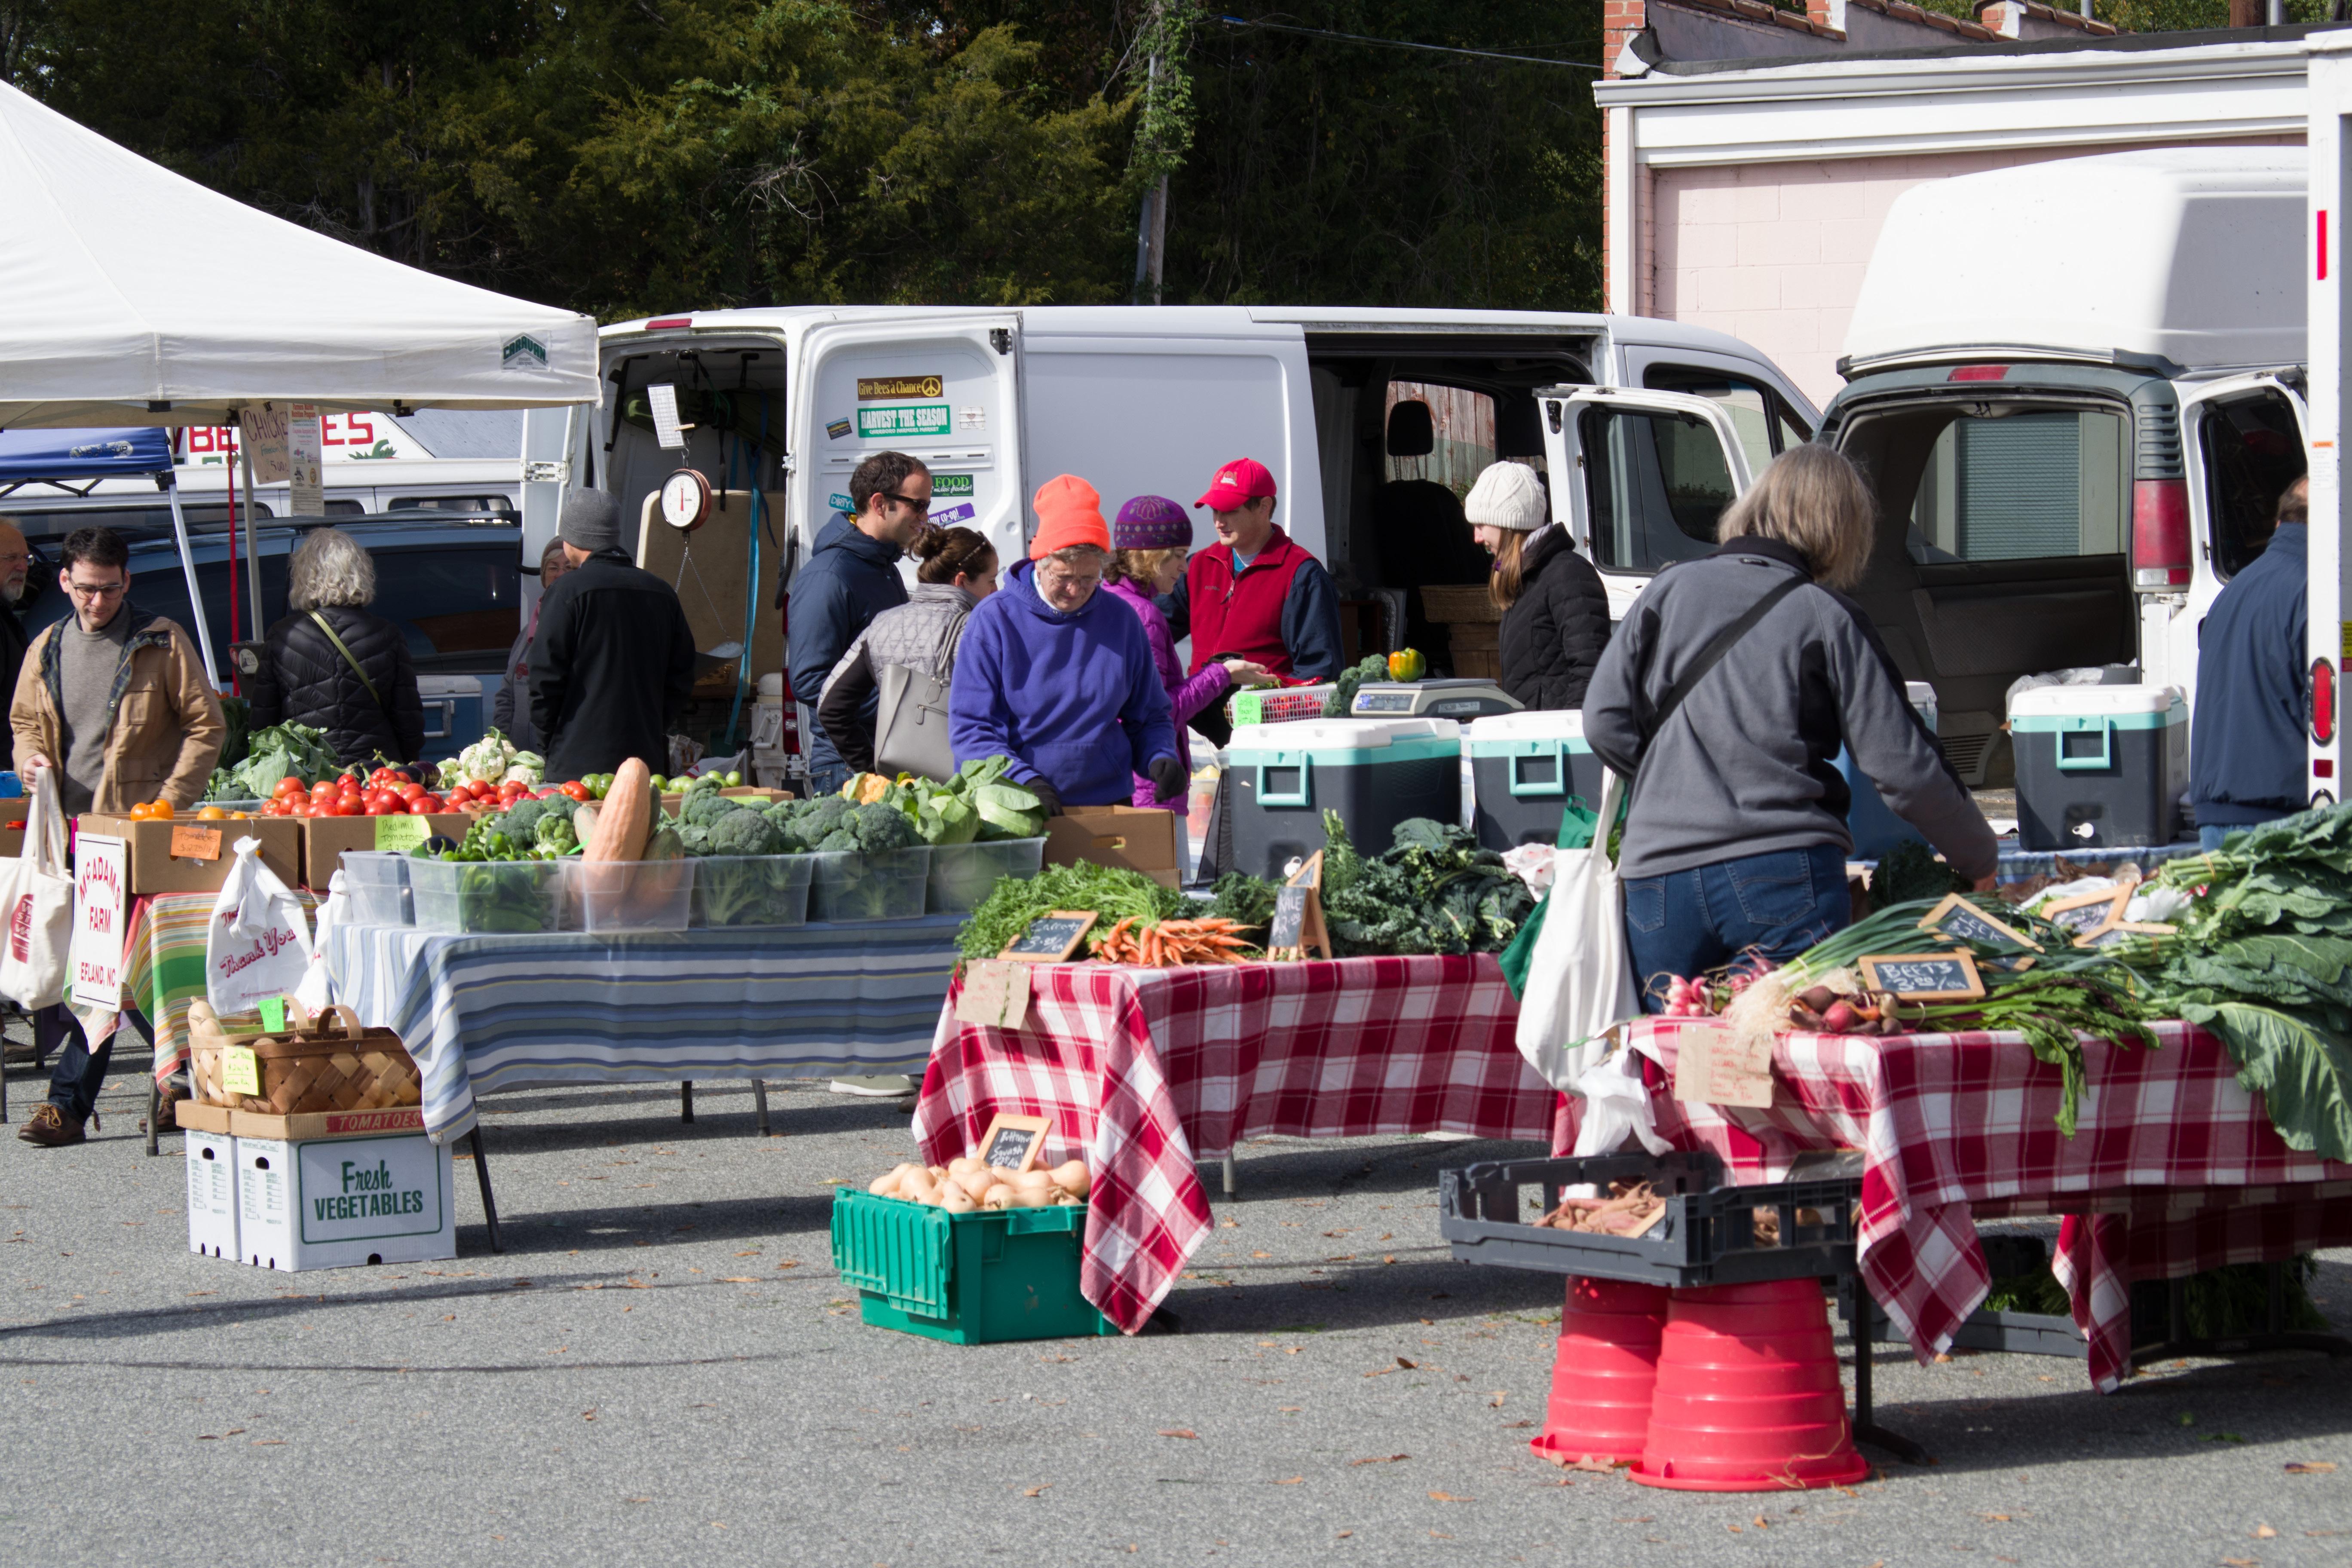 An outdoor farmer's market. Photo © Jillian Regan 2017